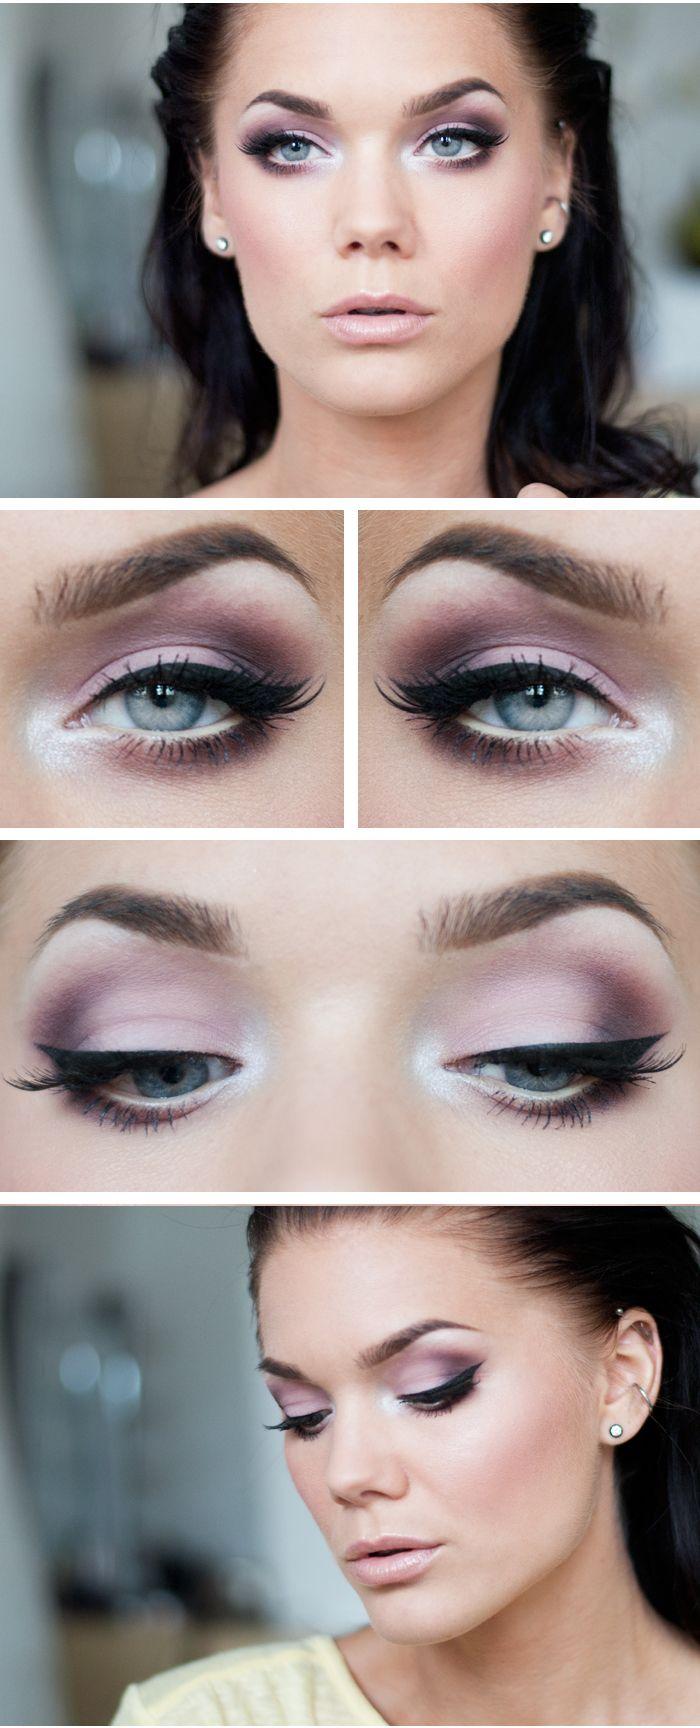 8 Best The Eyes Have It Images On Pinterest Beauty Makeup Jill Lip Matte 13 Purplish Plum Todays Look Lilac Linda Hallberg Name Says All Purple Wedding Makeuppurple